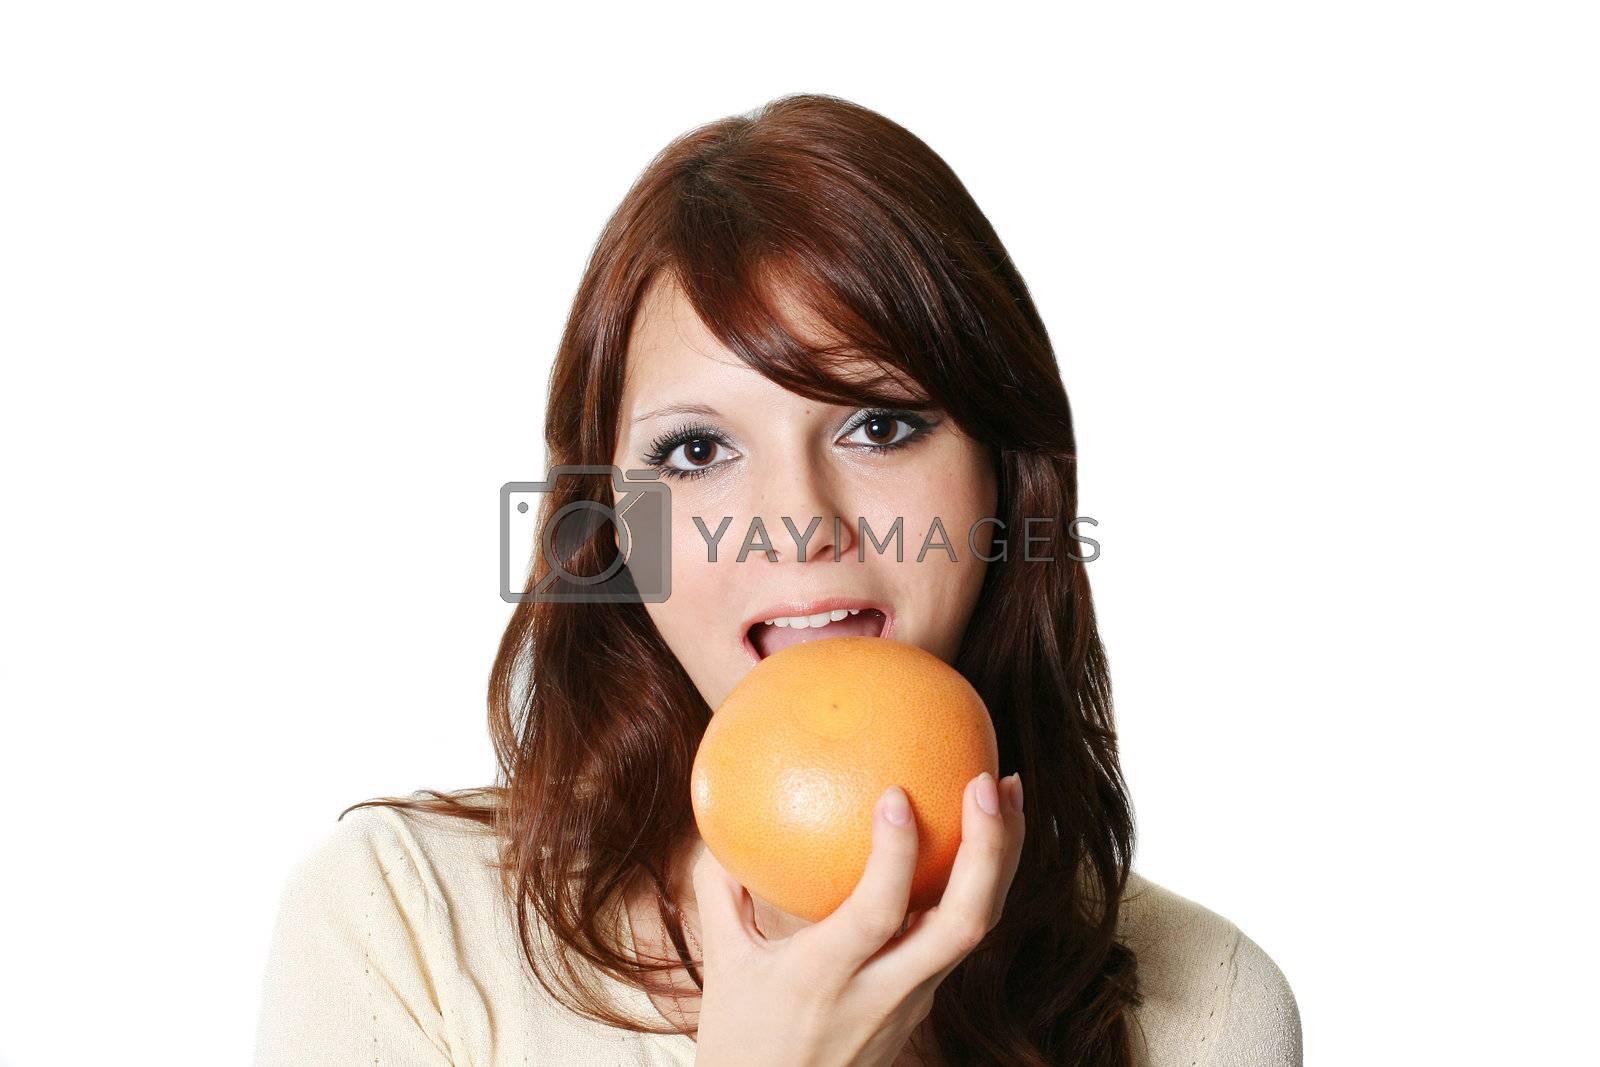 females food eating beauty girls fruit cheerful